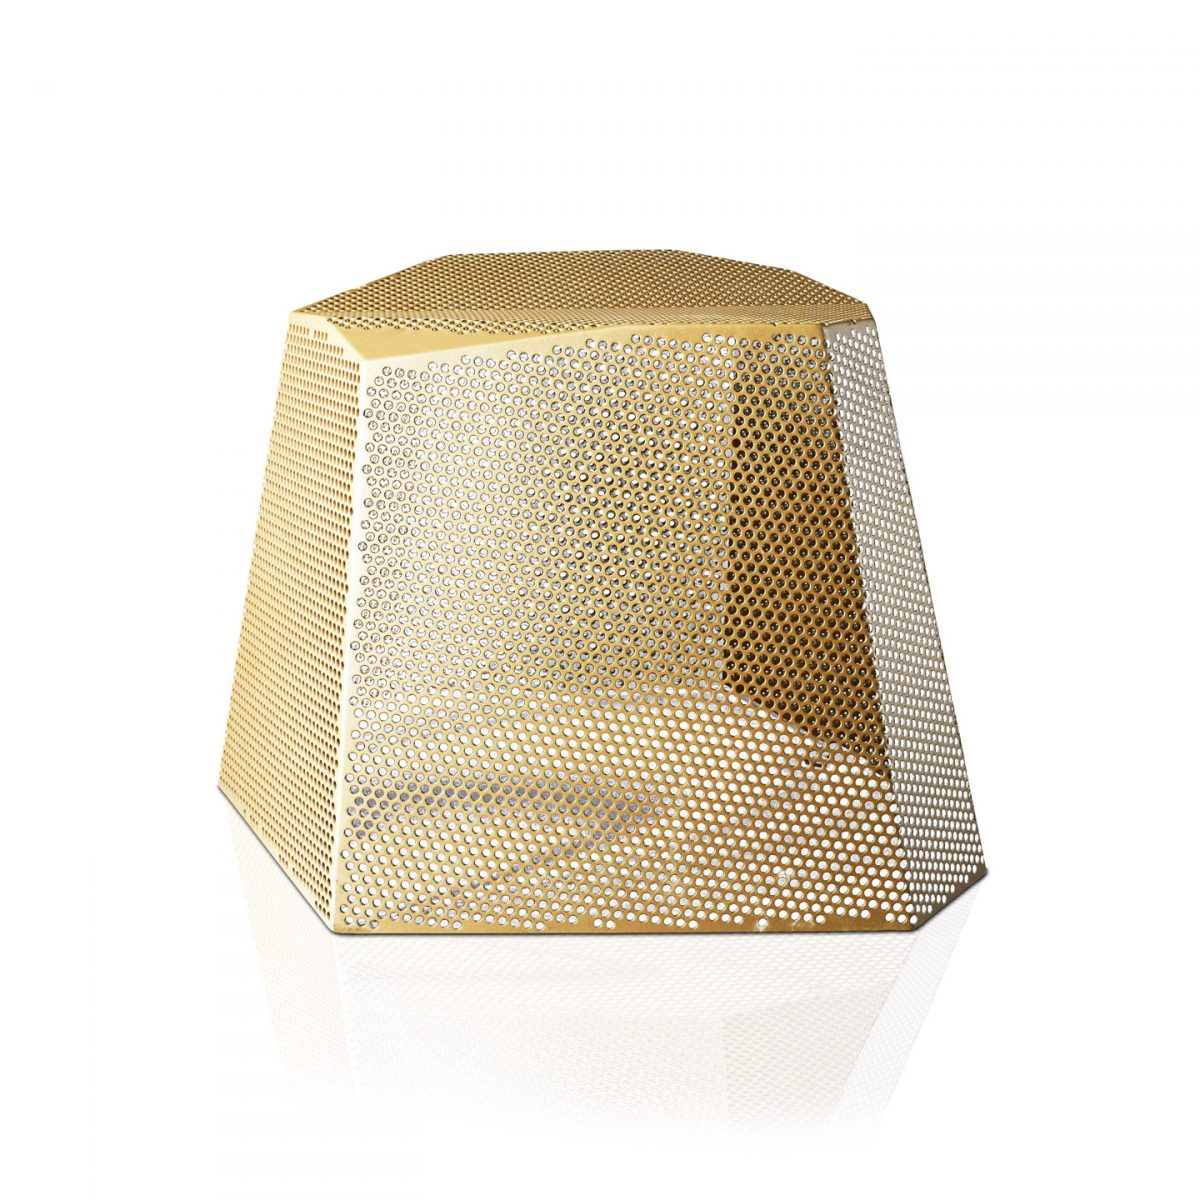 design franck magné assise Rocs